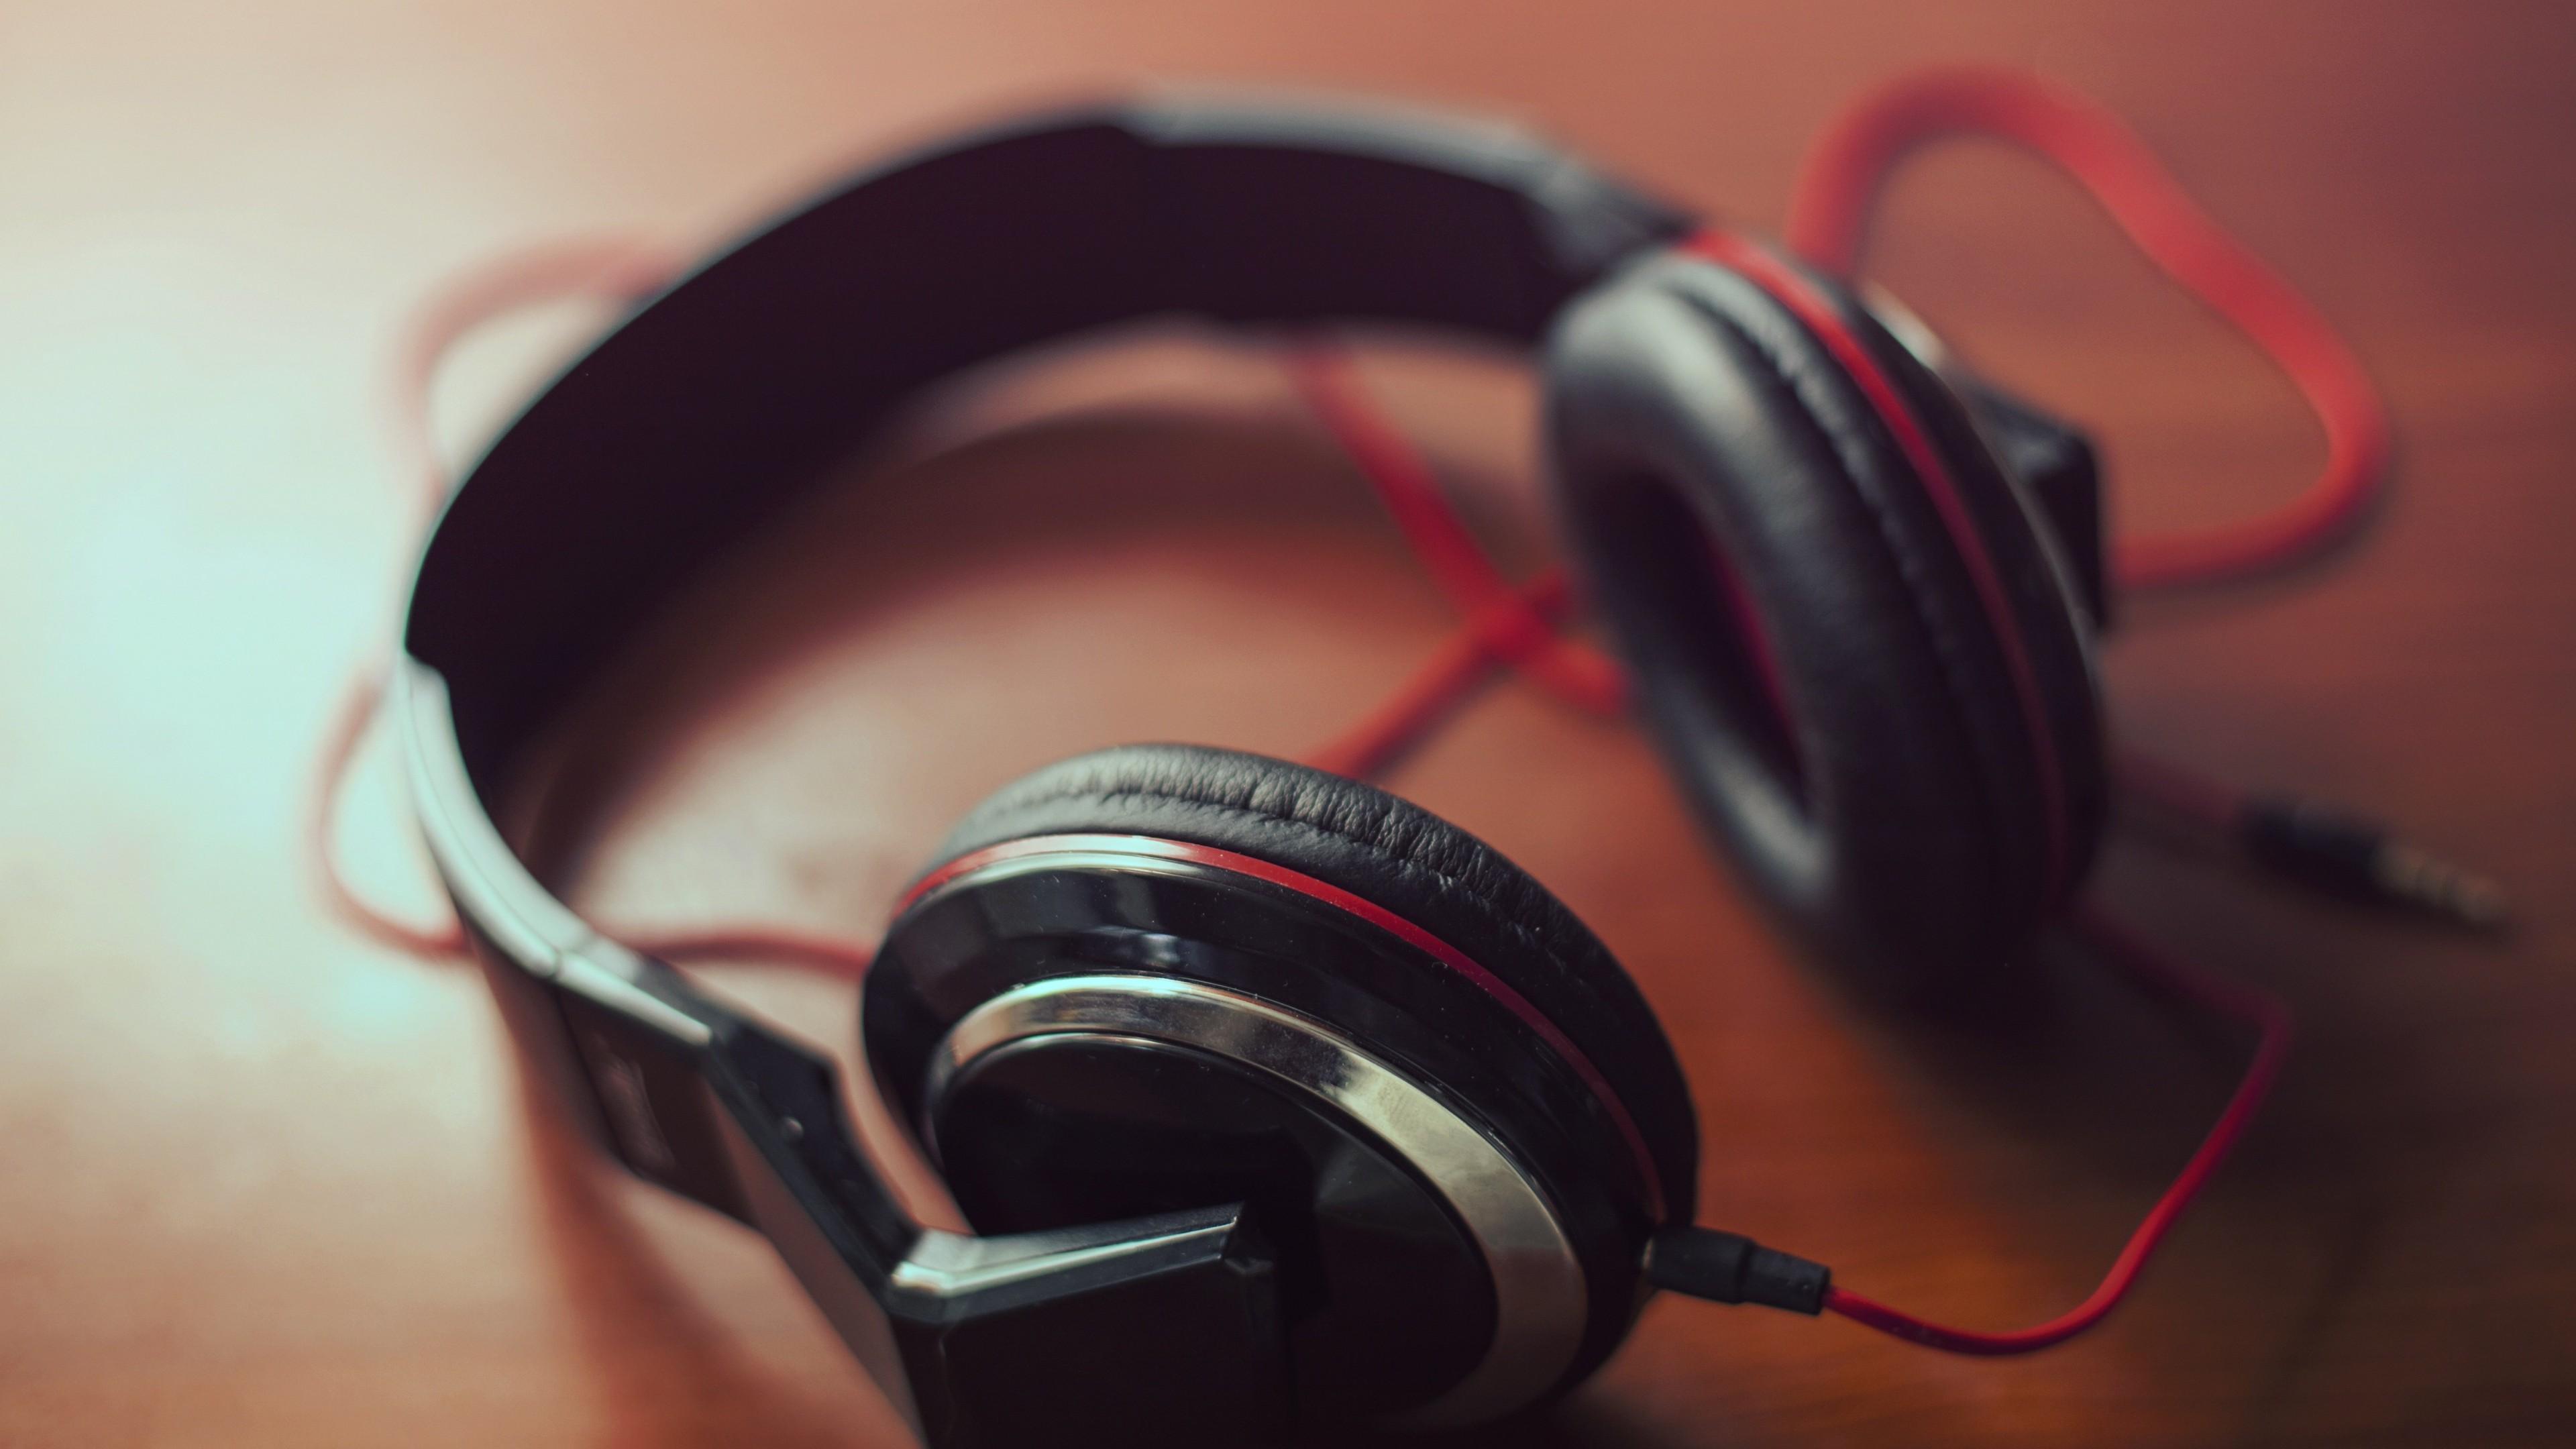 Headphones Earphone Music Sound Ultra Hd Wallpaper By Matipatloko